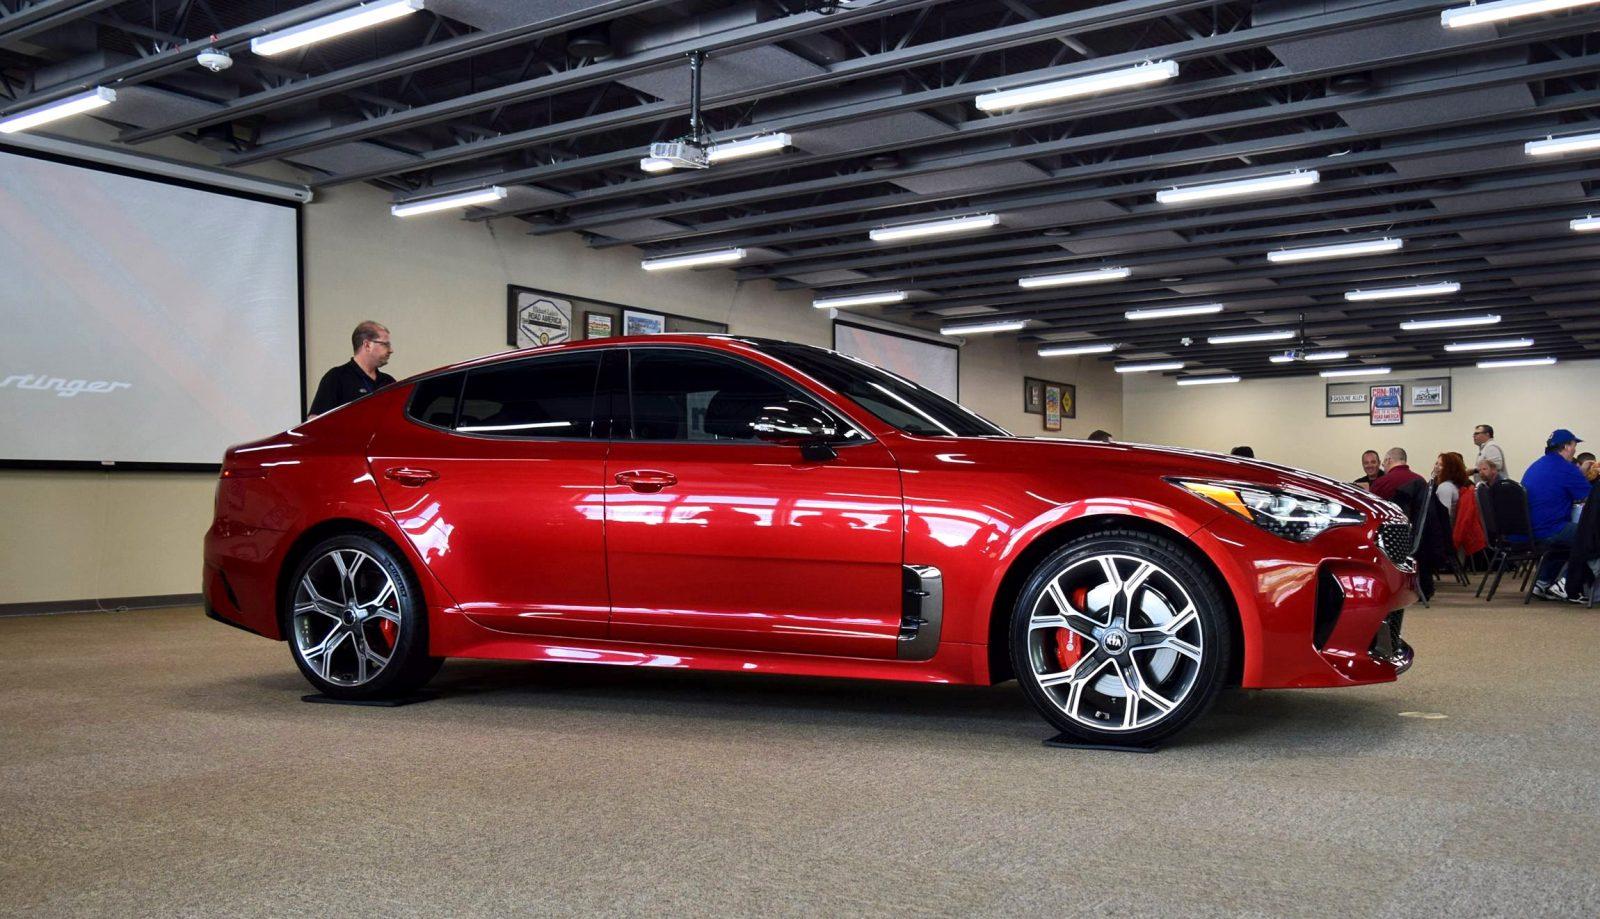 2018 KIA Stinger GT AWD 48s 167MPH Stats Confirmed